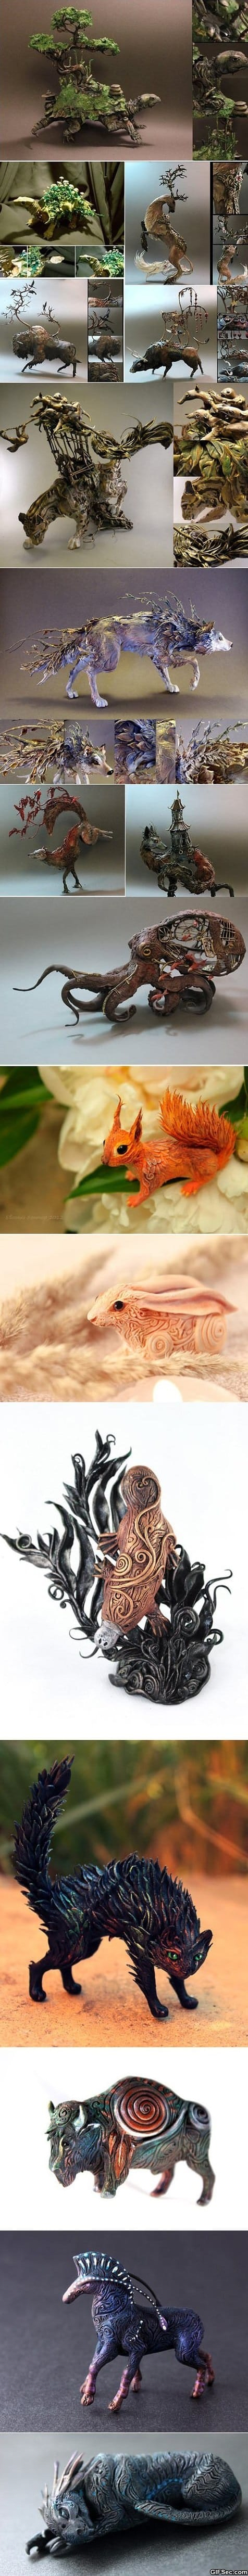 lol-handmade-animal-art-pieces